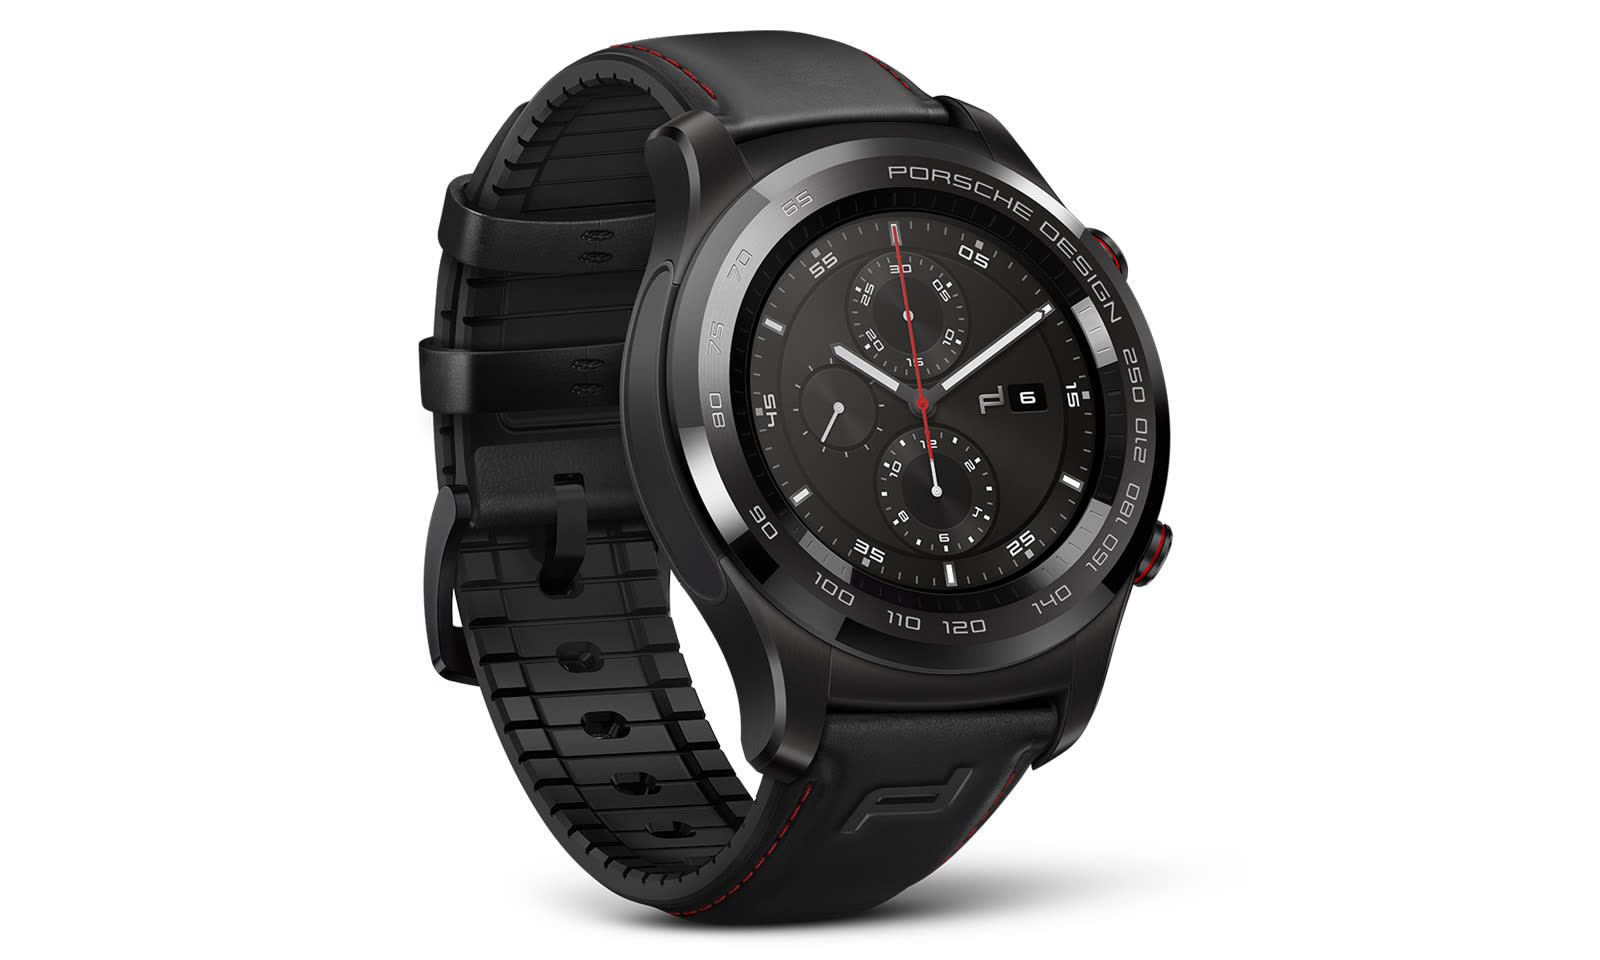 604dd2cf534a Huawei s Watch 2 costs  550 more with a Porsche Design logo